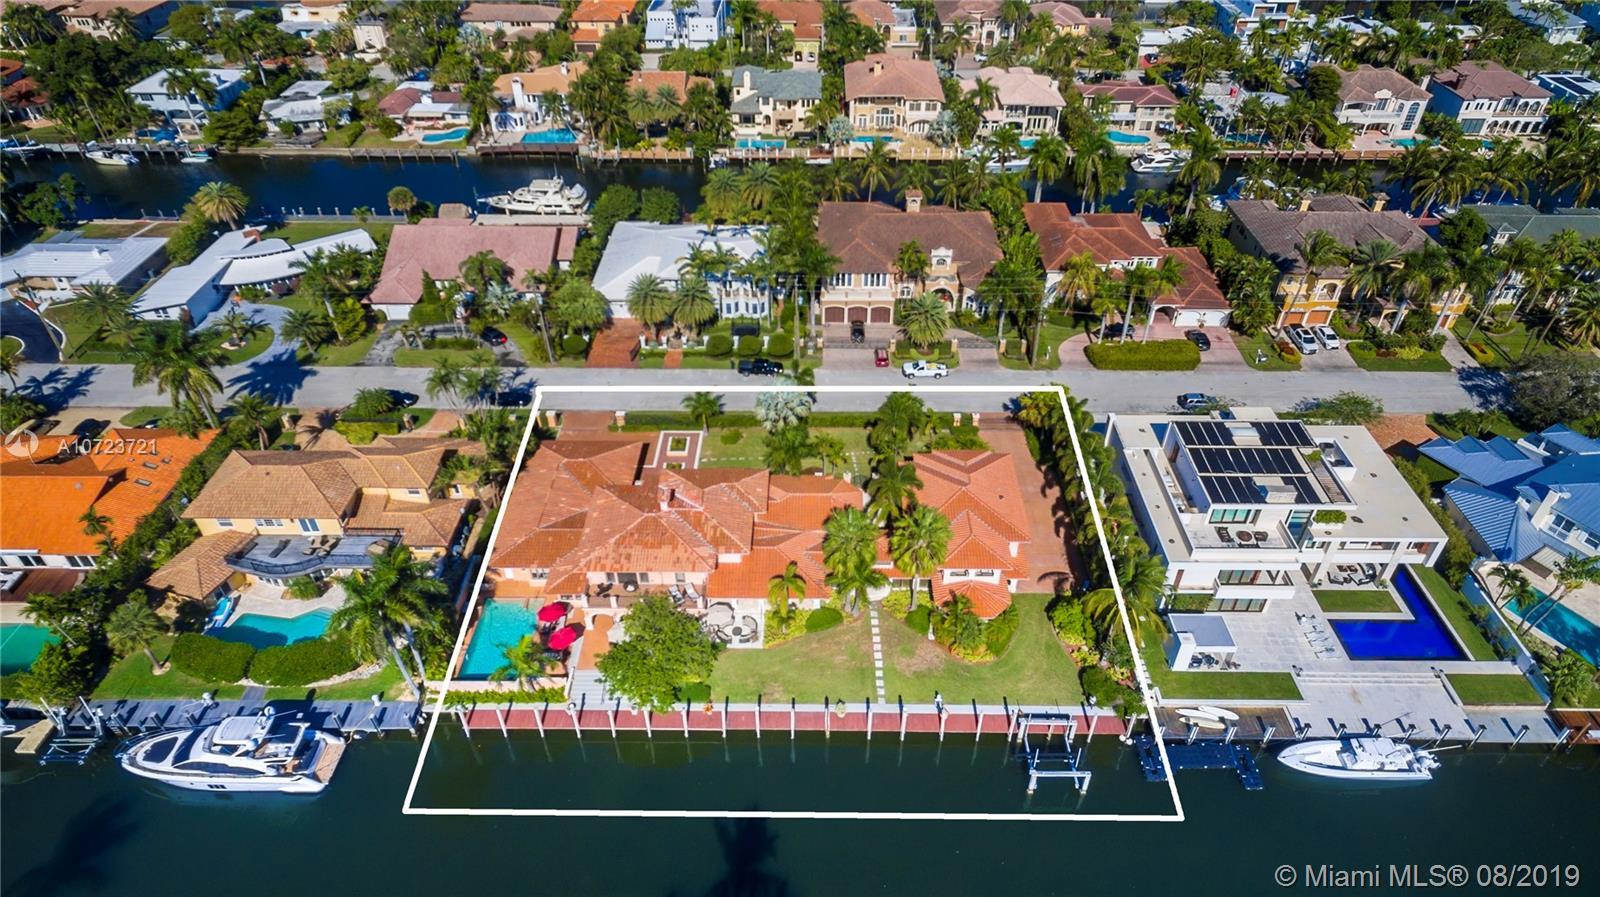 14 Pelican Dr - Fort Lauderdale, Florida